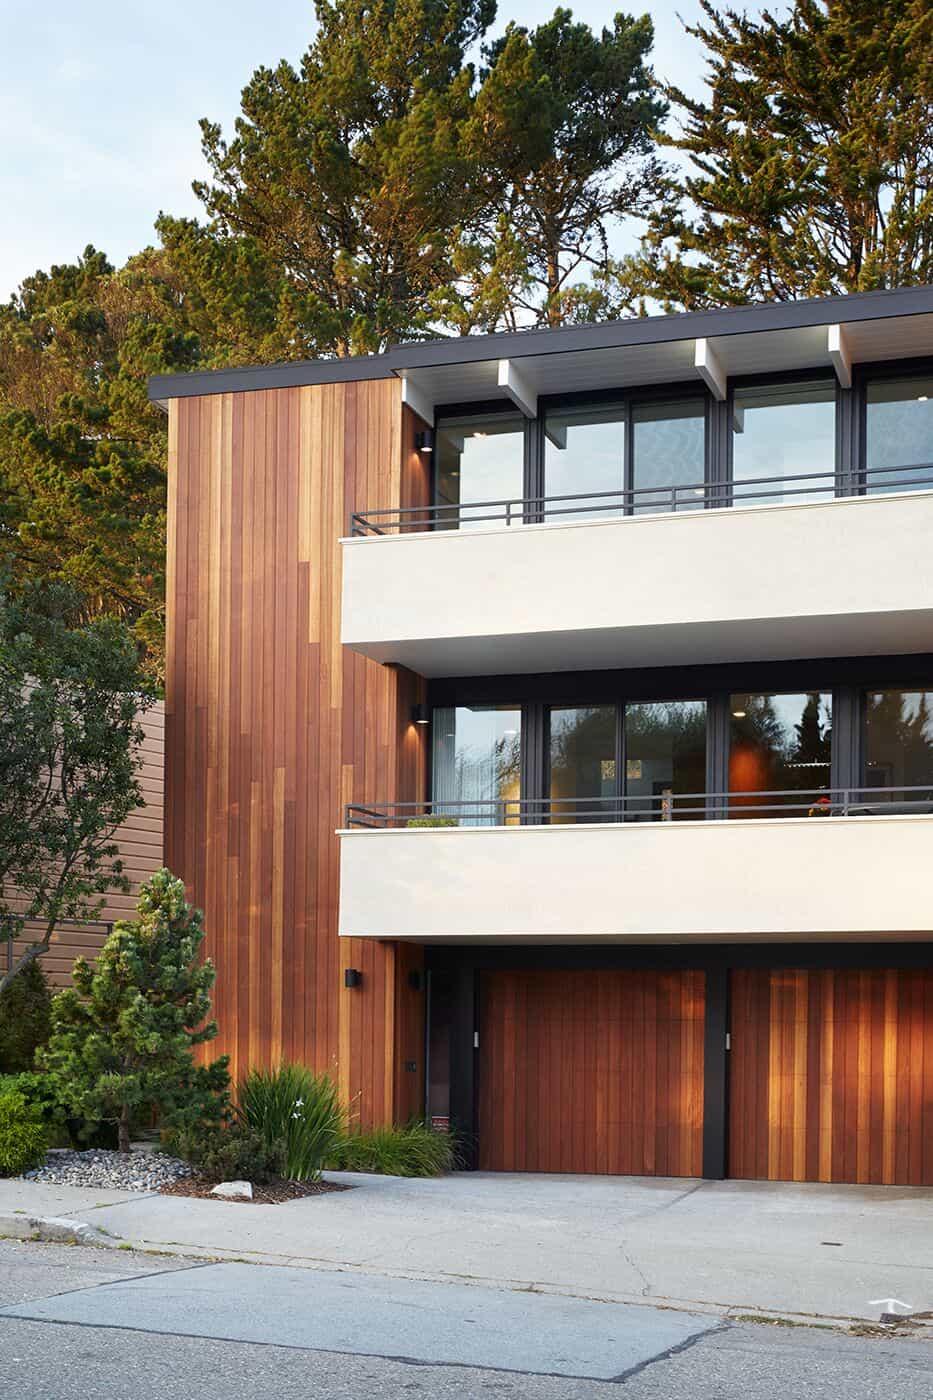 San Francisco Eichler Remodel-Klopf Architecture-18-1 Kindesign